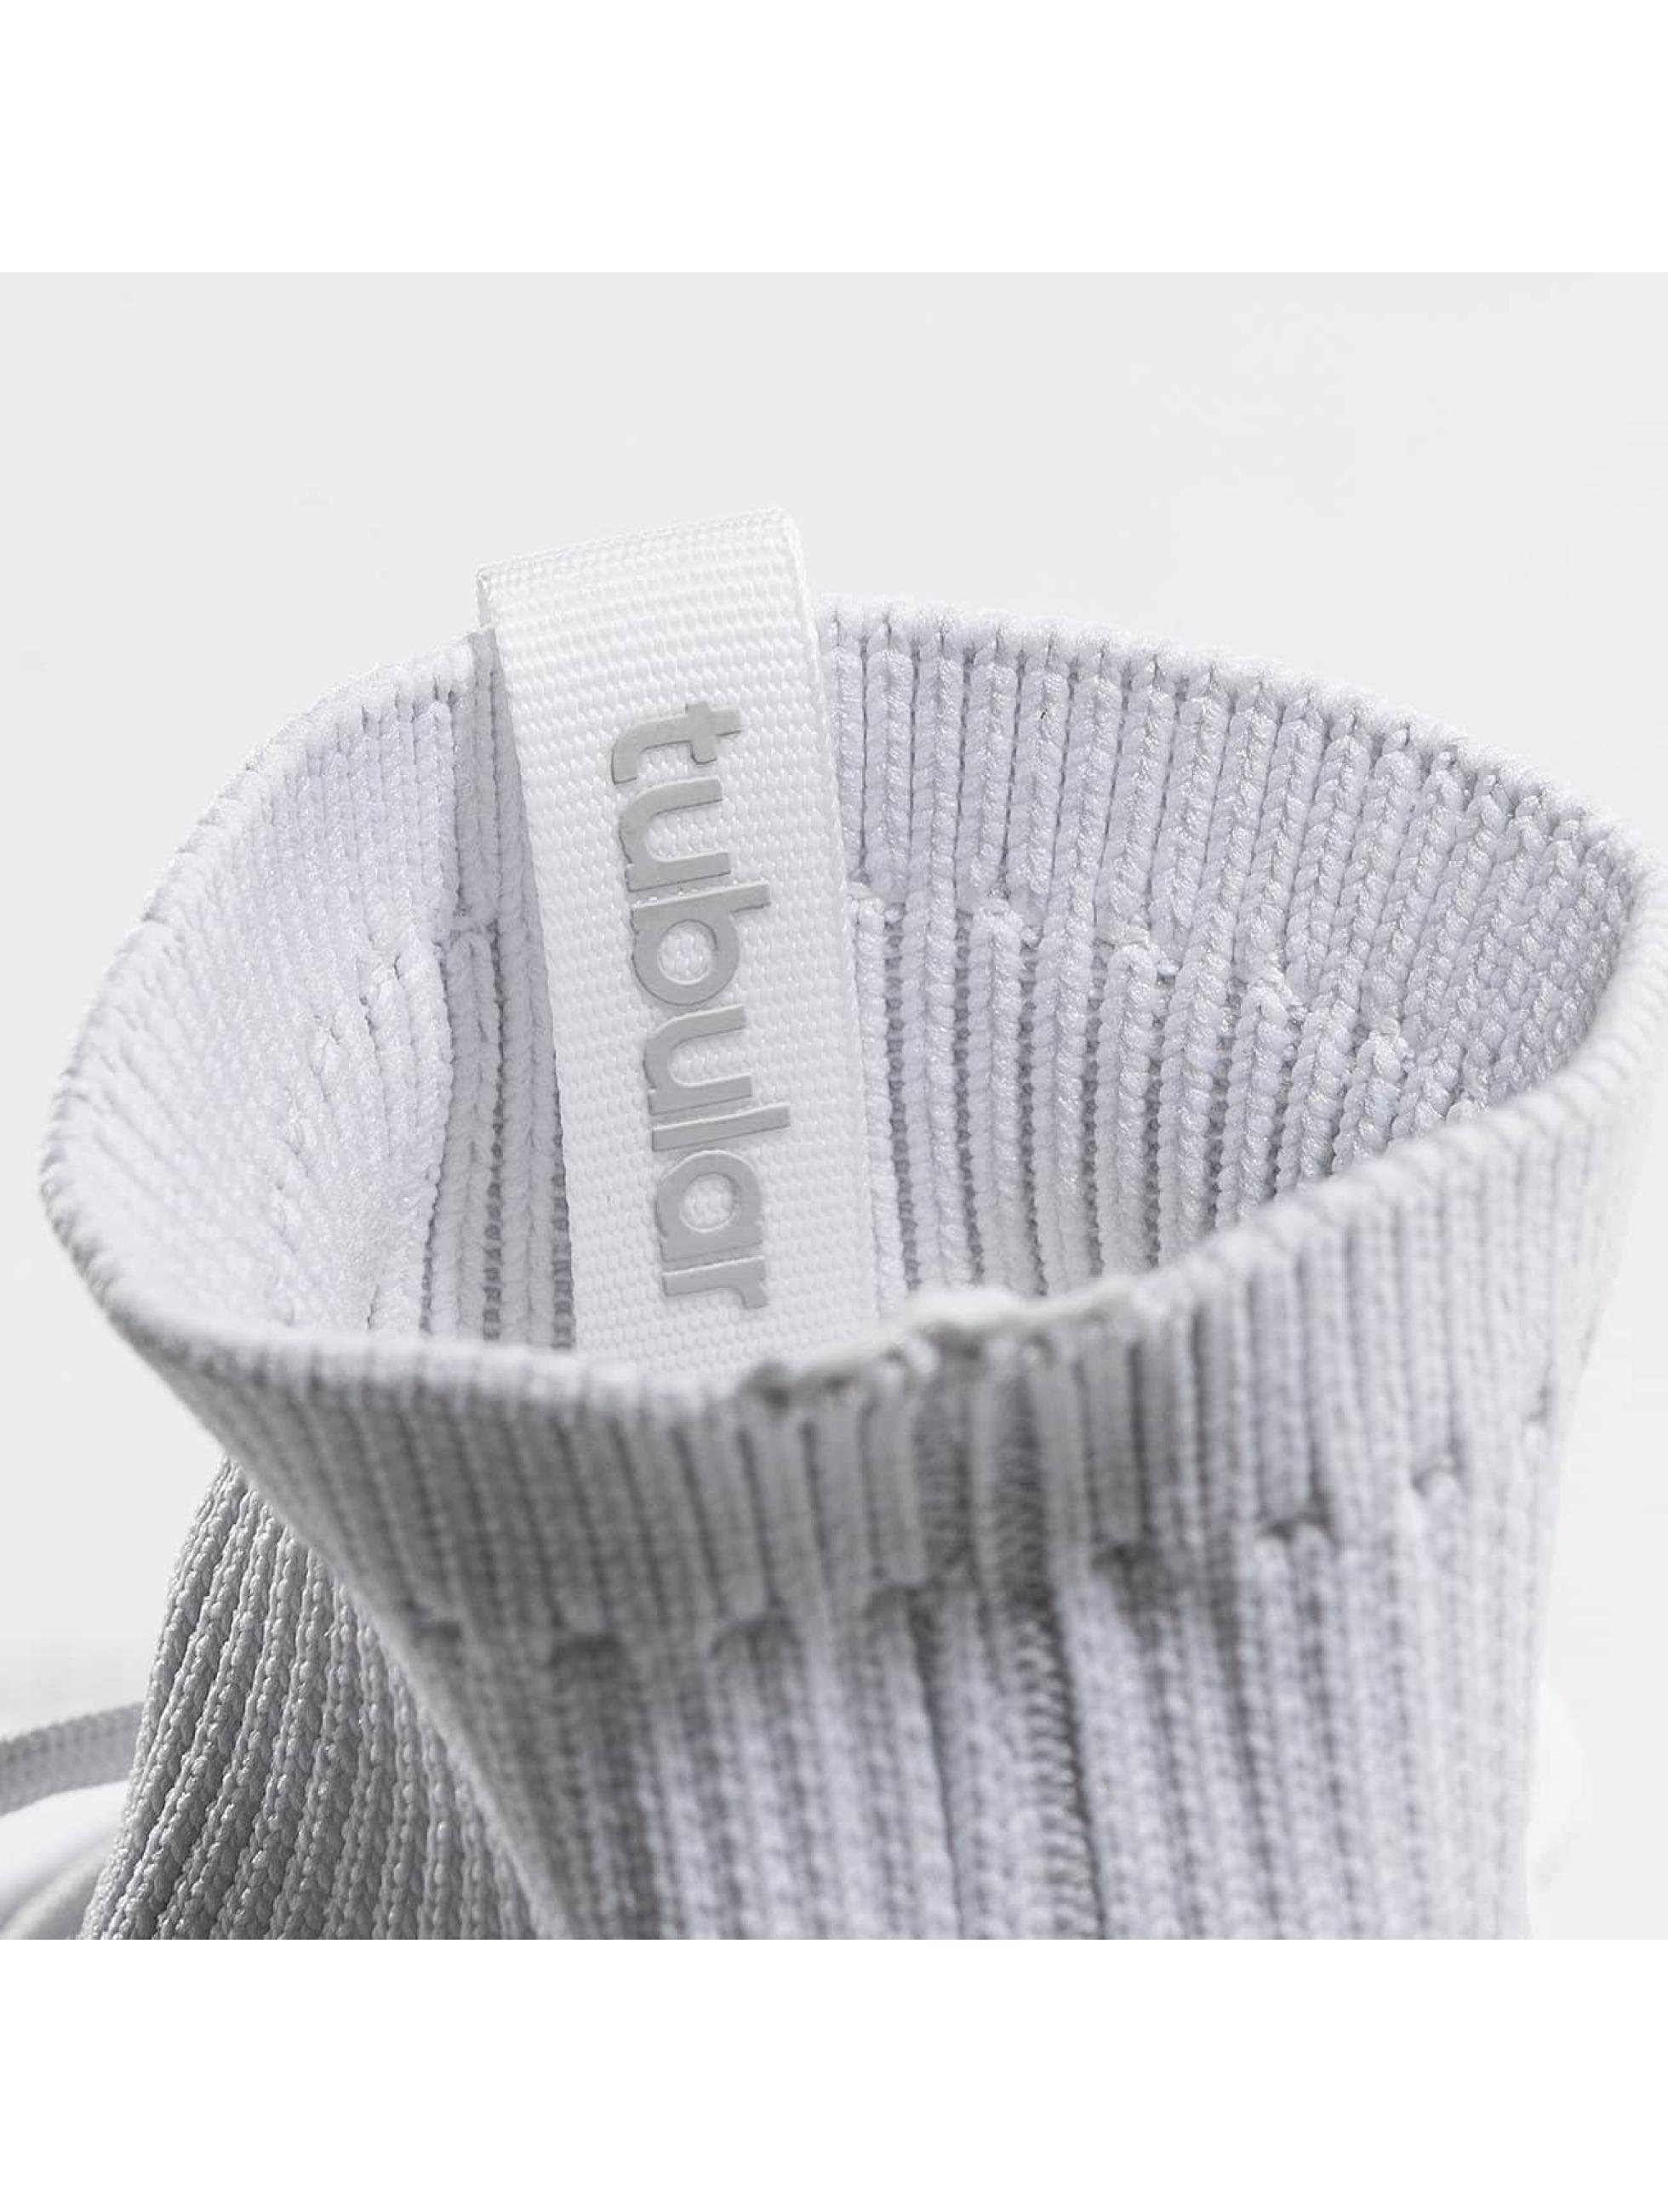 adidas originals Sneakers Tubular Doom PK white